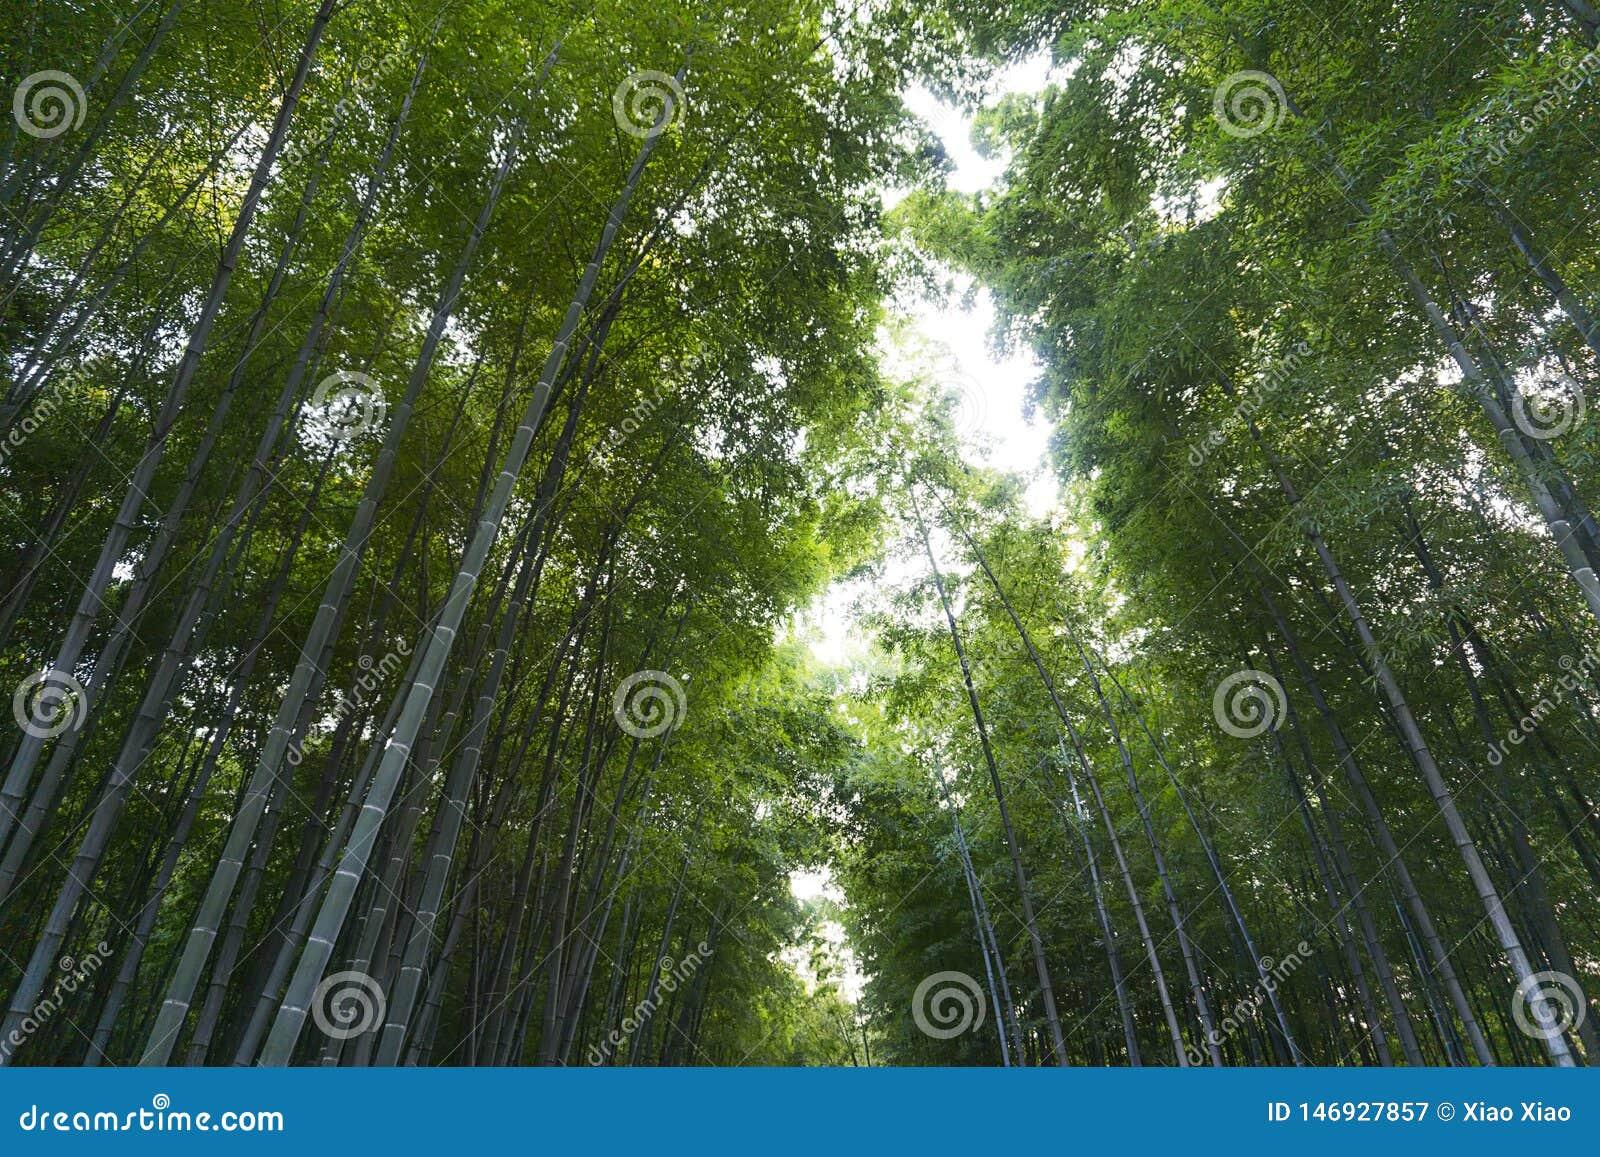 Bamb? m?s forrest